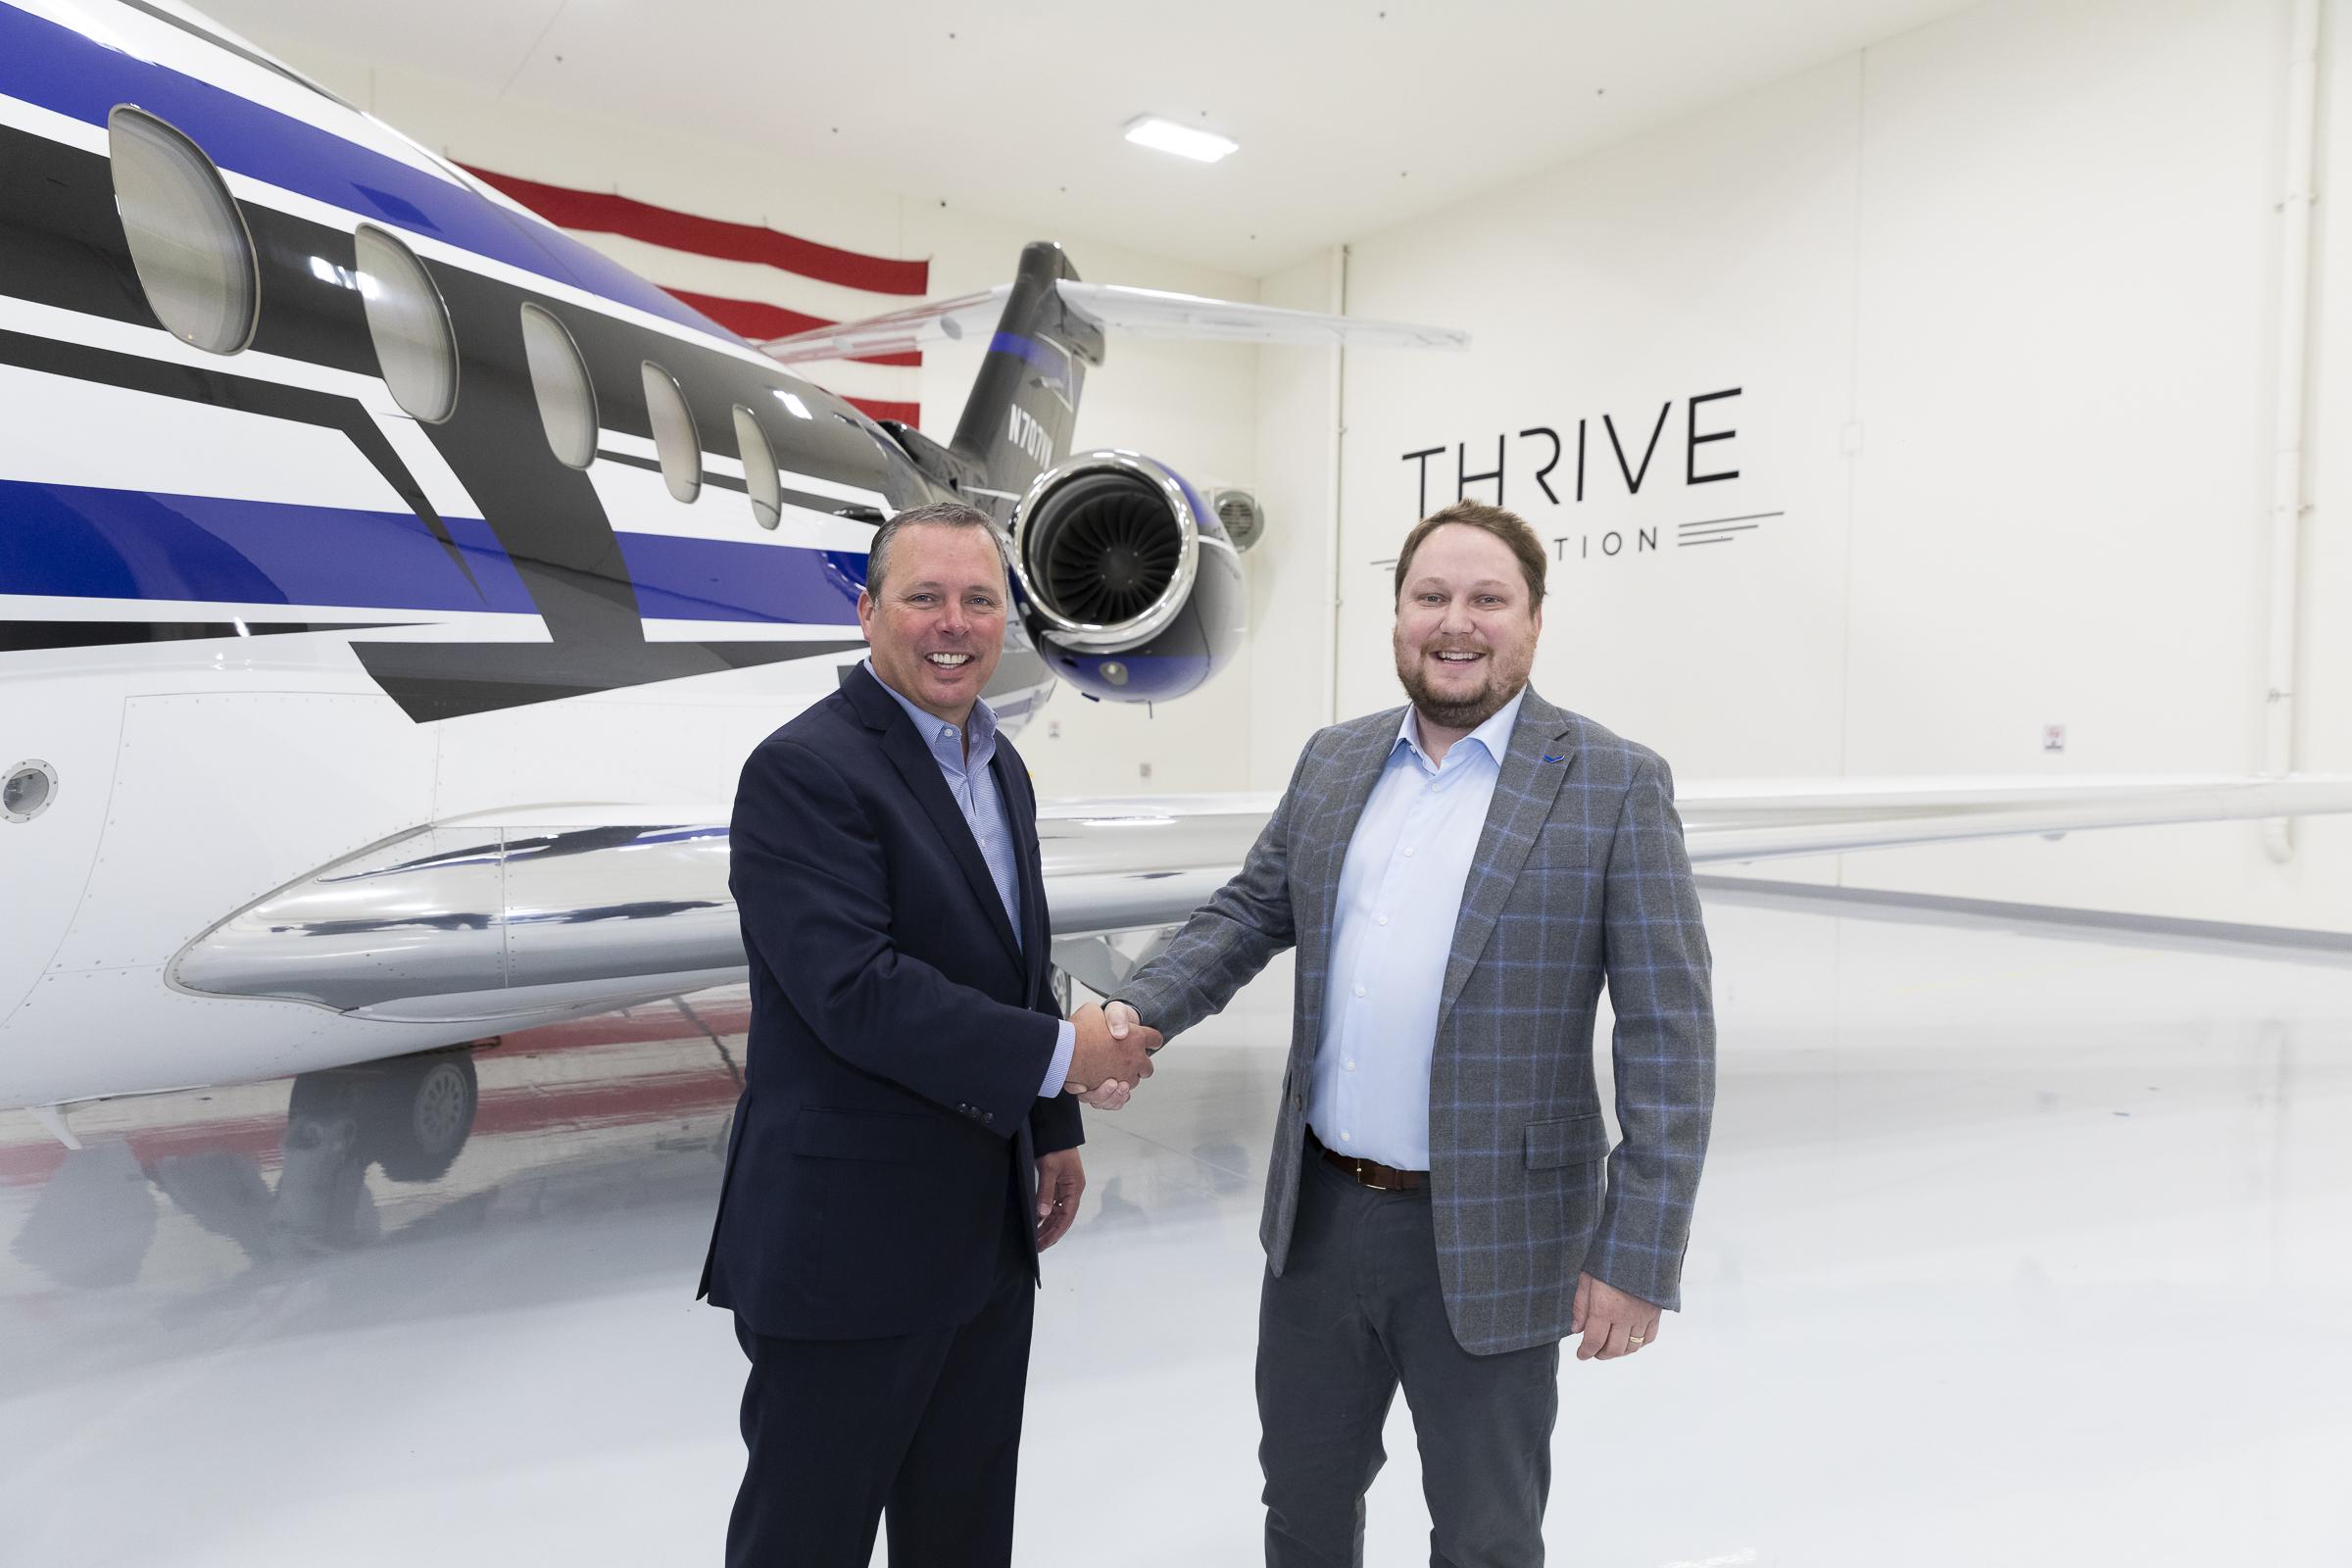 Thrive Aviation Order.jpg